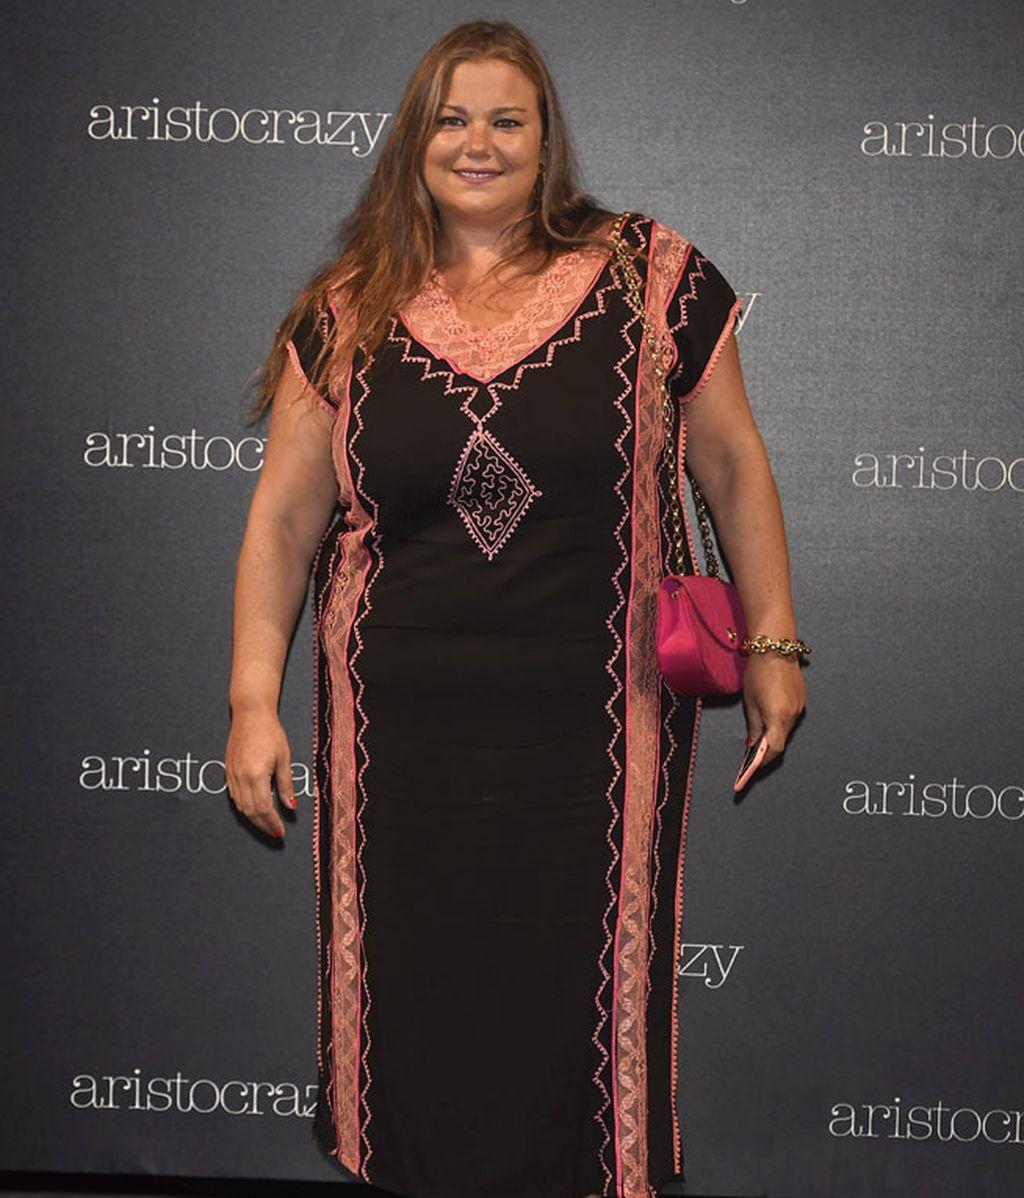 Caritina Goyanes, imagen de la firma de ropa de tallas grandes Couchel